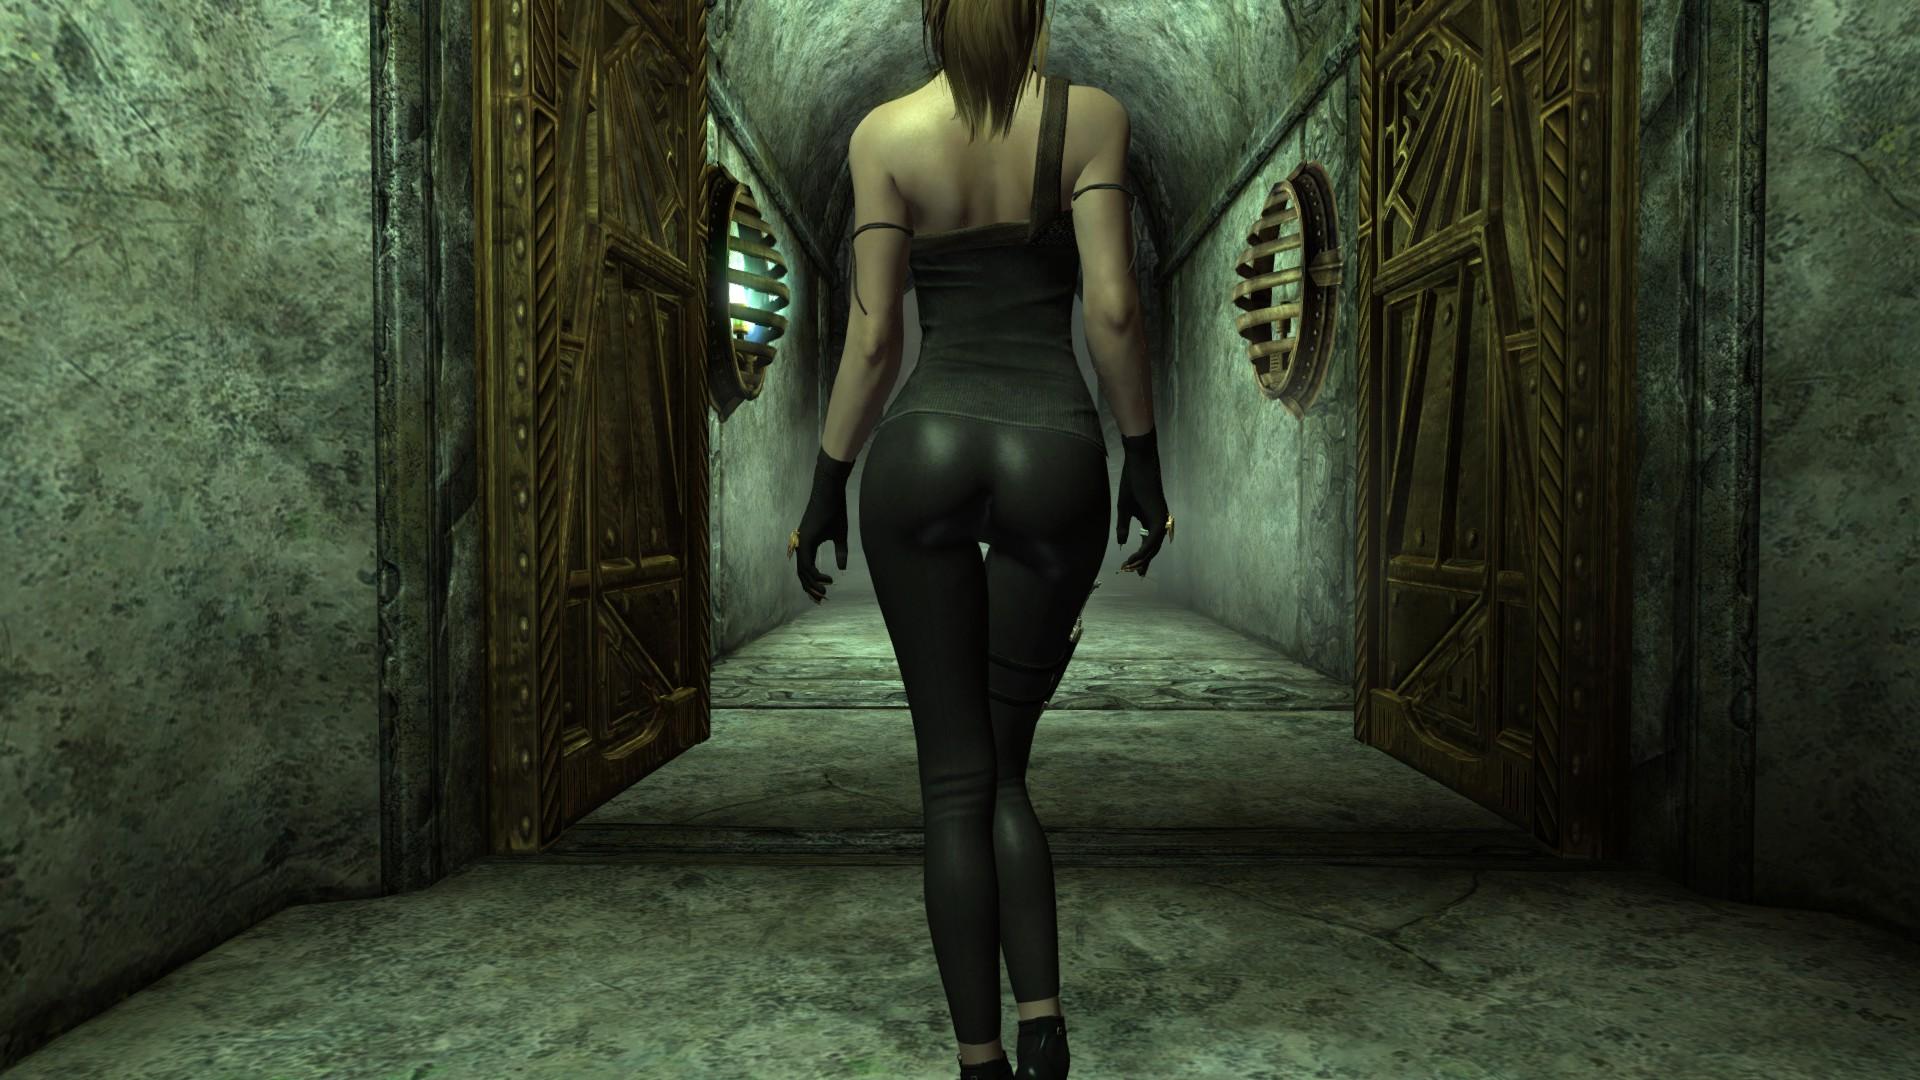 20180721190342_1.jpg - Elder Scrolls 5: Skyrim, the